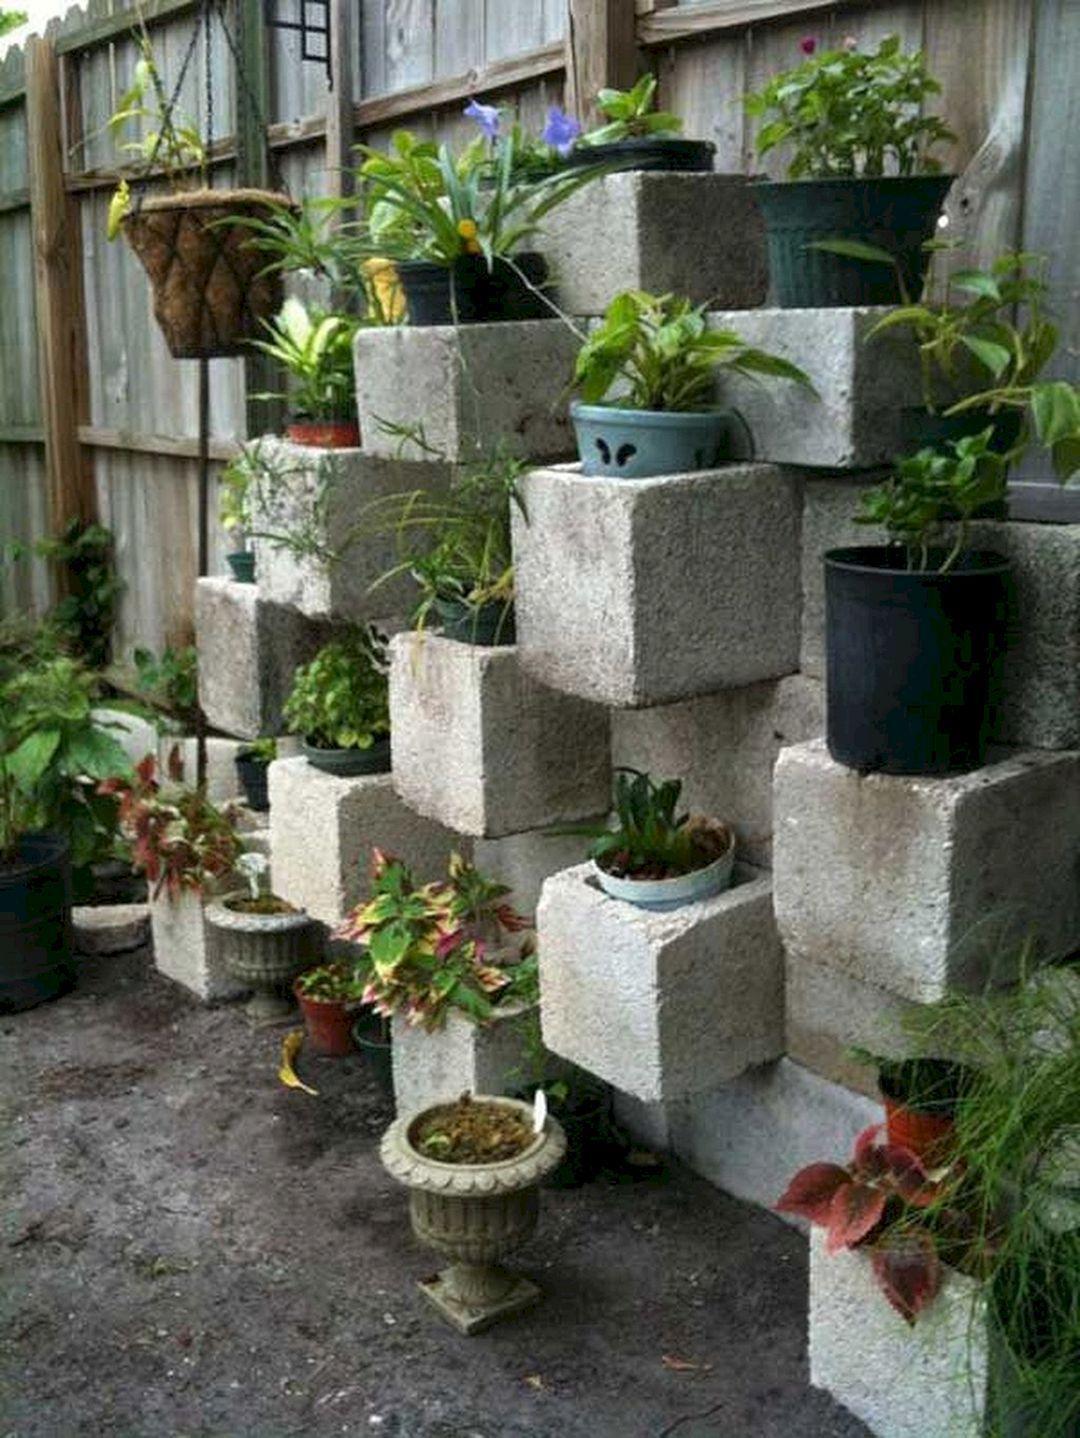 Diy Garden Pot Ideas With Images Cinder Block Garden Budget